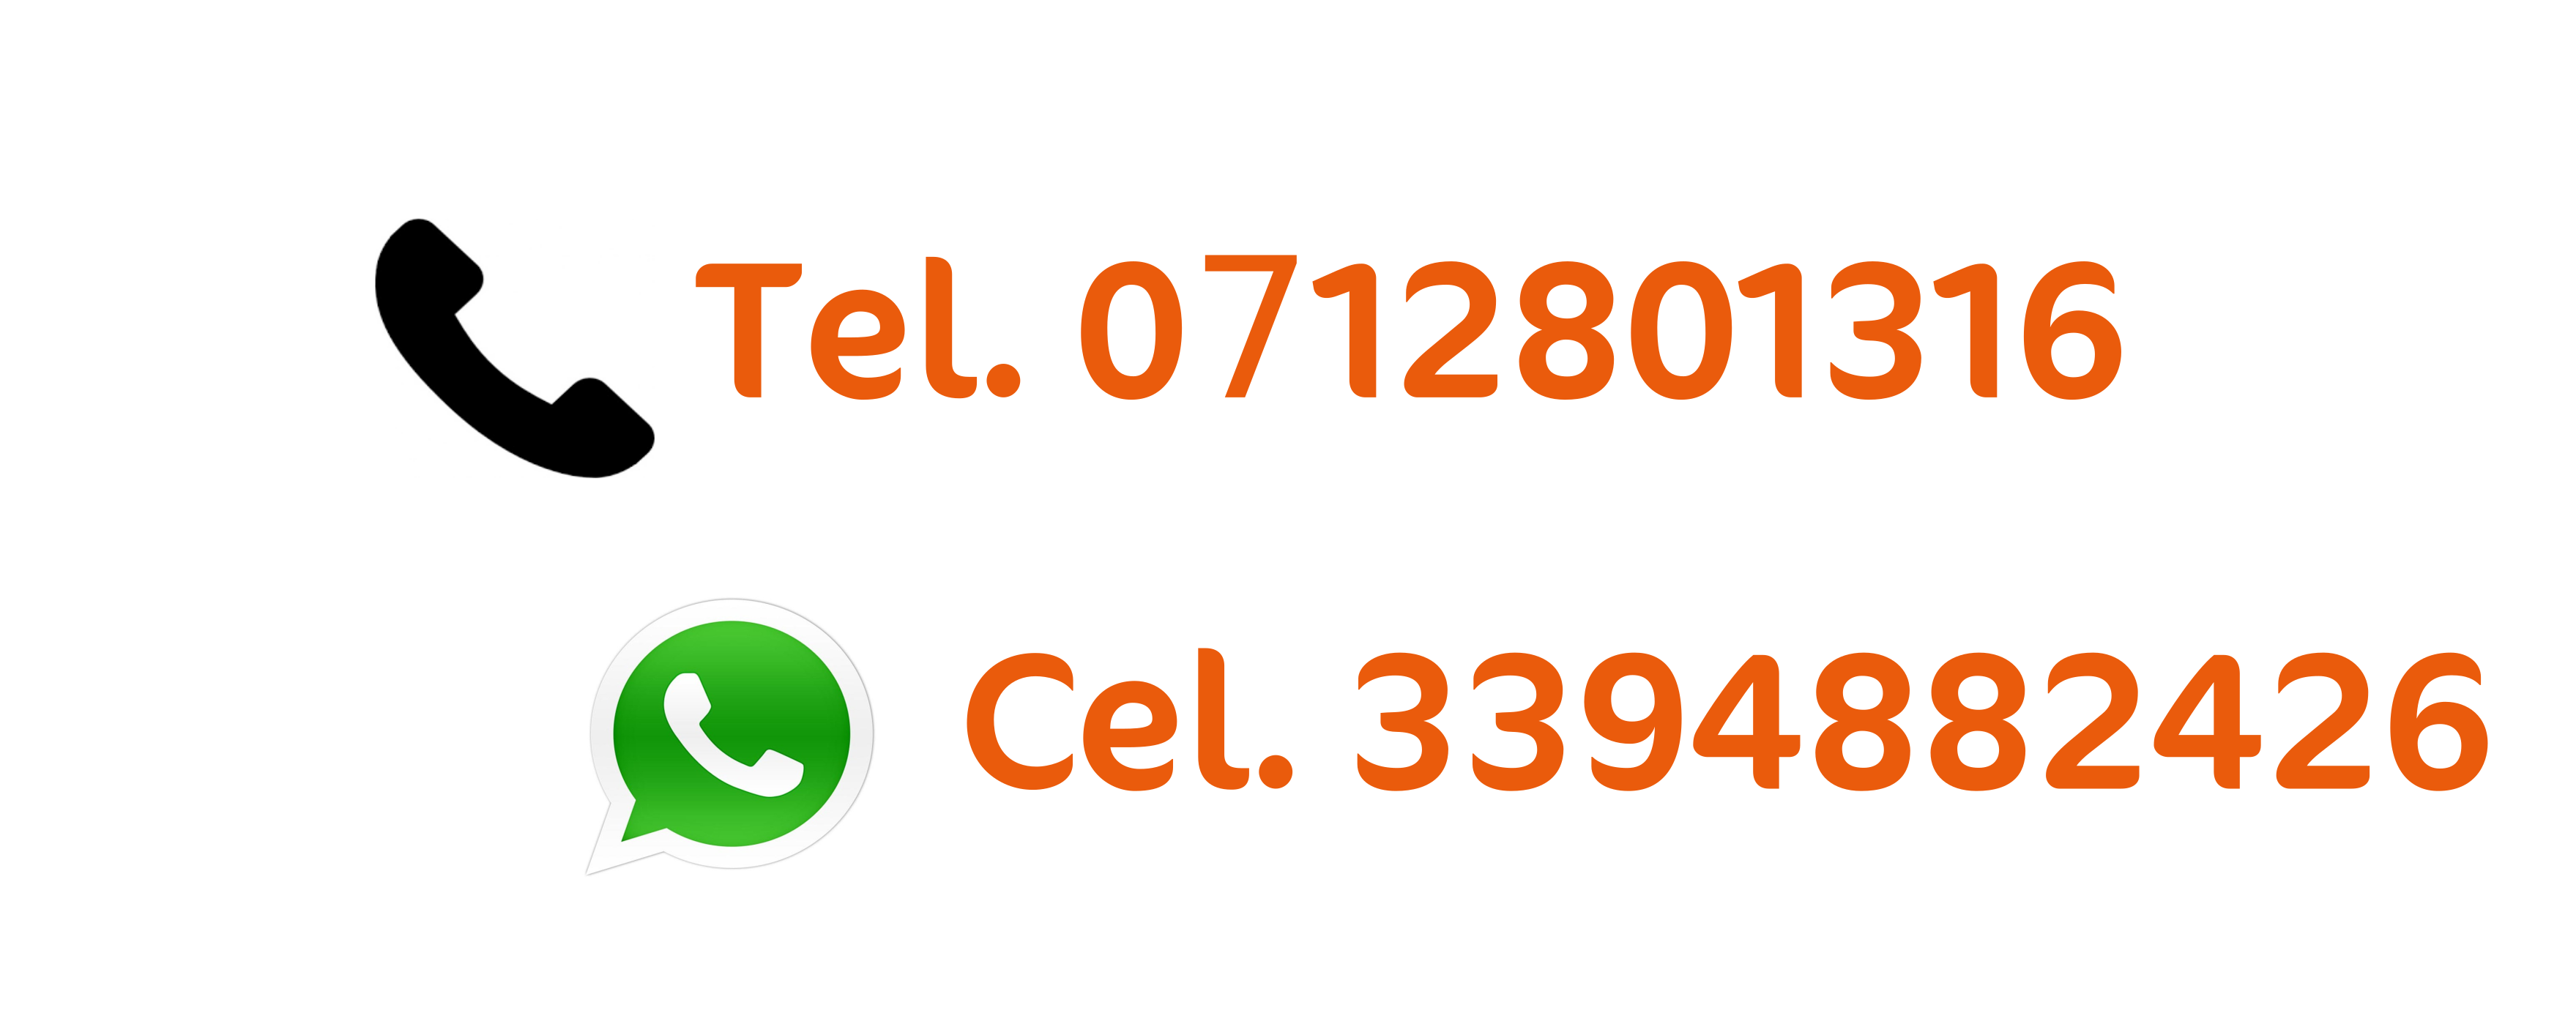 chiamaci al 3394882426